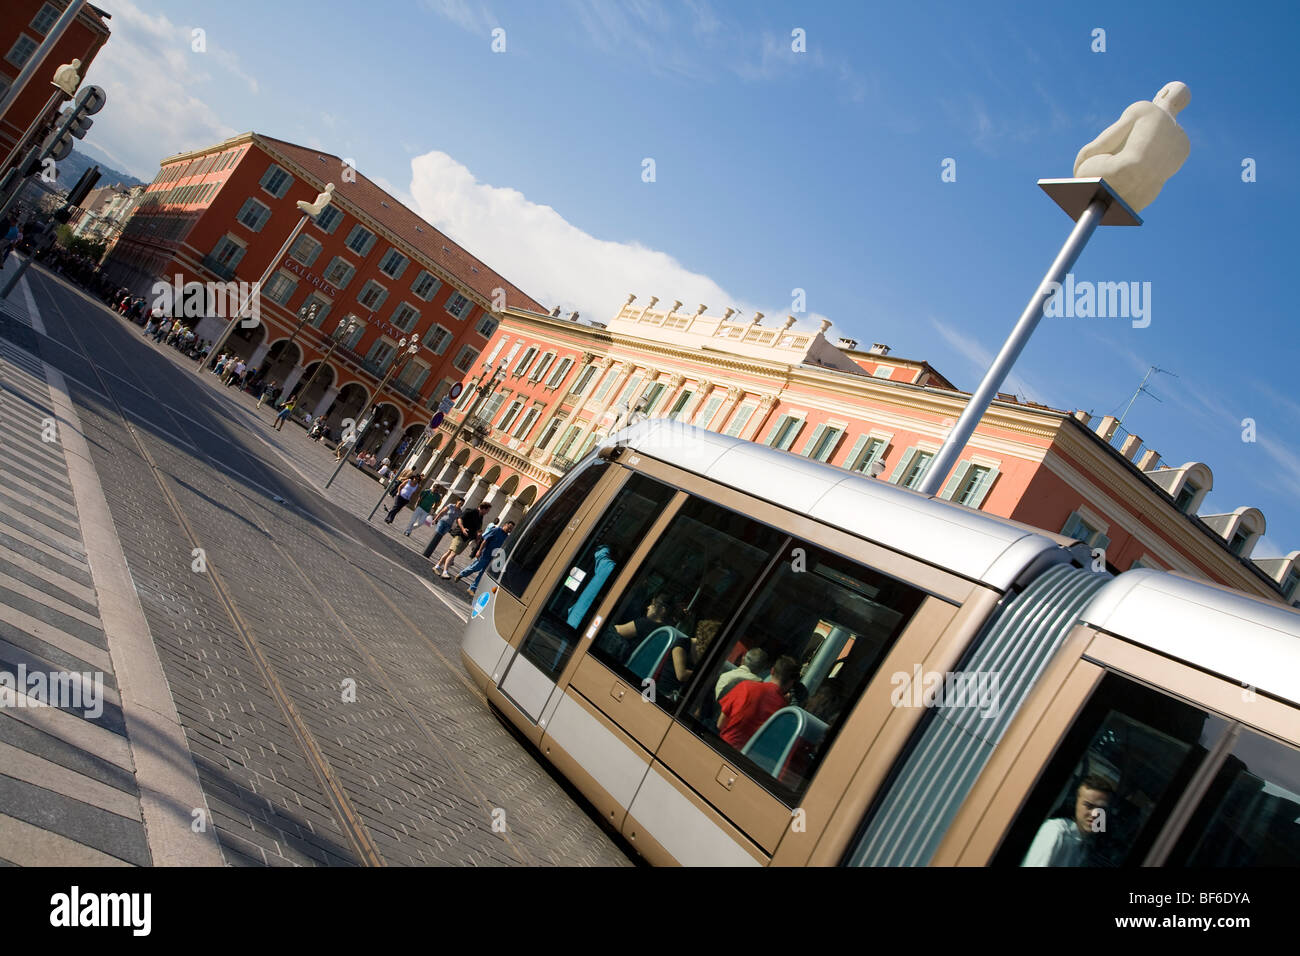 Place Massena, Streetcar Line T1, Artwork from J. Plensa ( Conversation Nice ), Nice, Cote D Azur, Provence, France - Stock Image